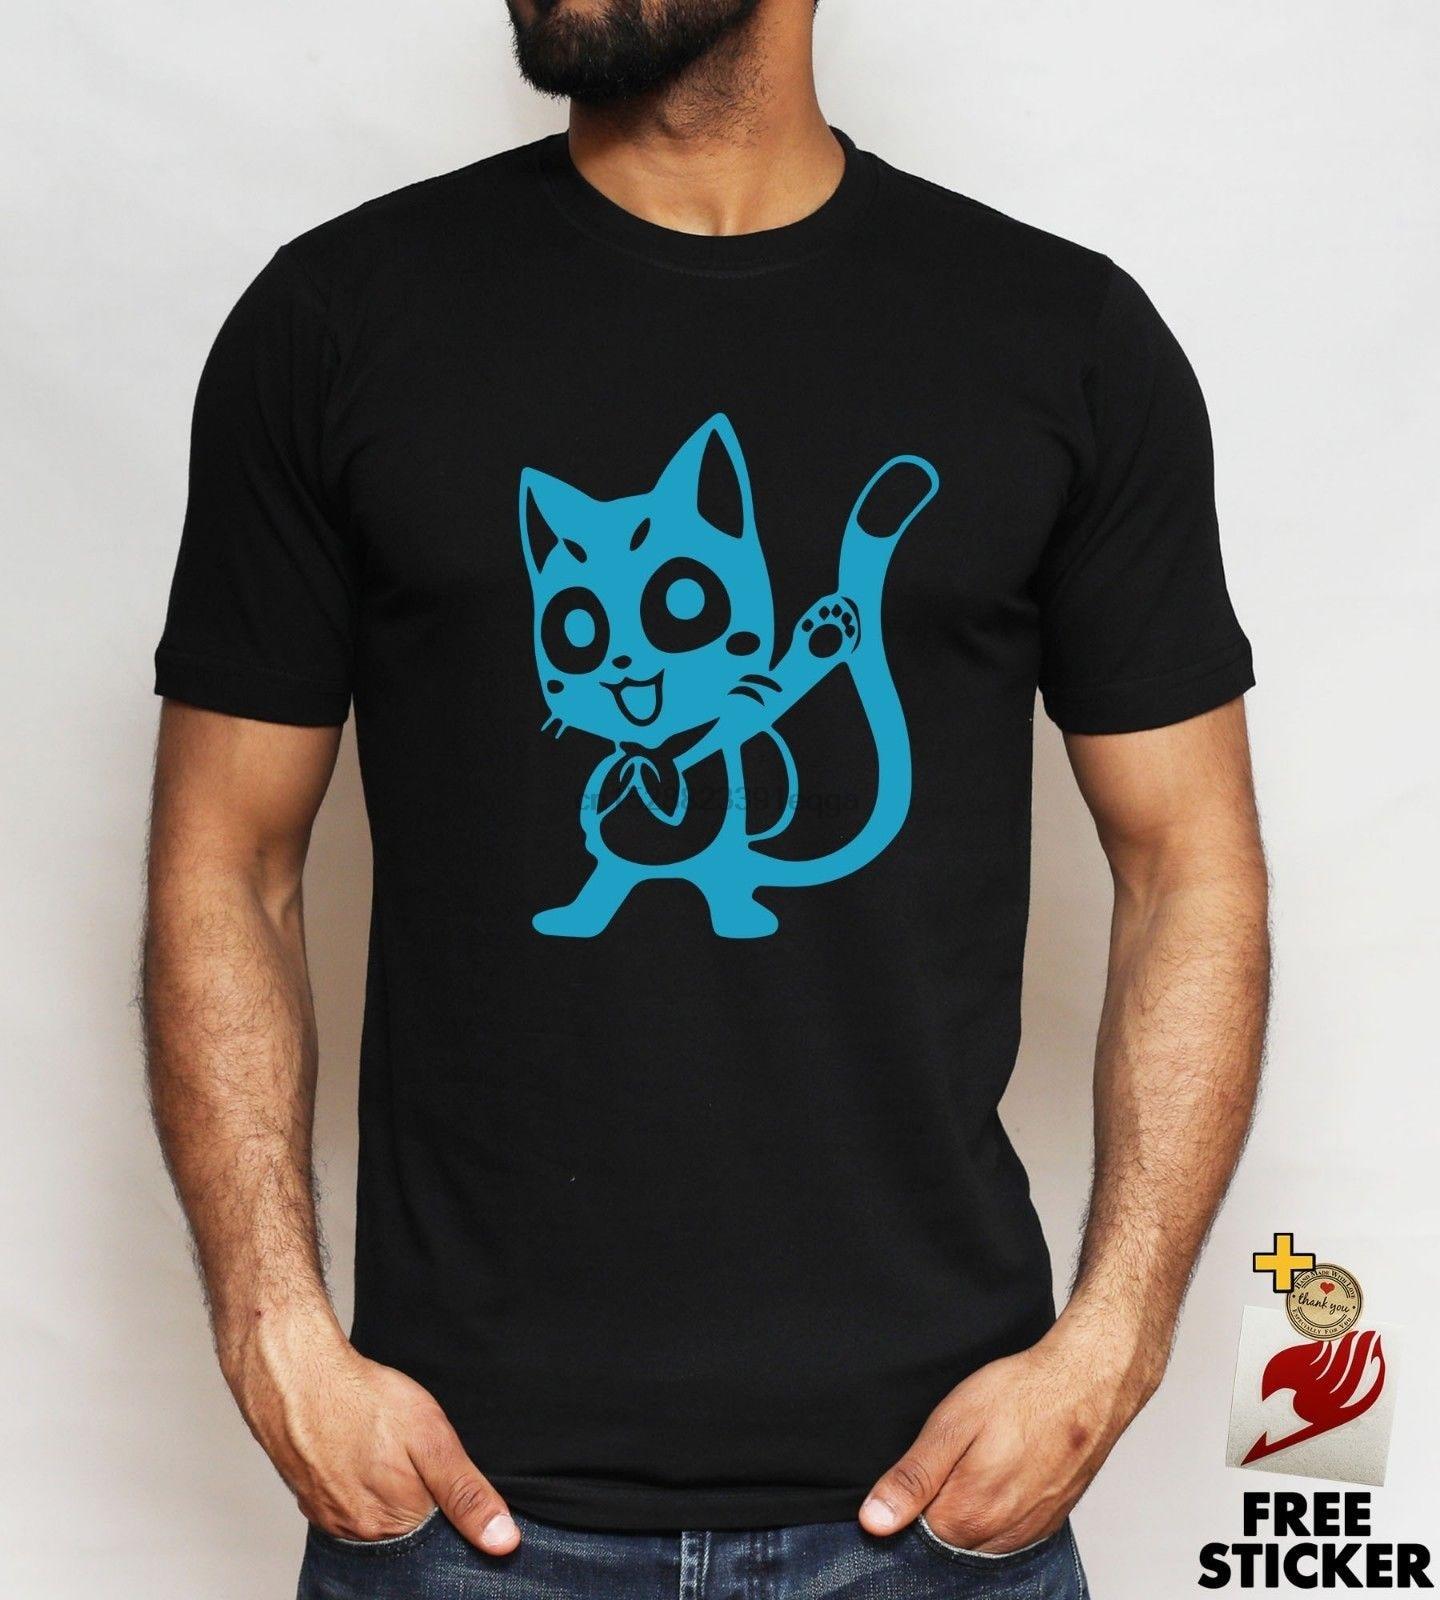 Fairytail feliz camiseta Natsu Lucy Erza gris Anime Manga t negro blanco Unisex camiseta de Hip Hop verano hombres moda camiseta